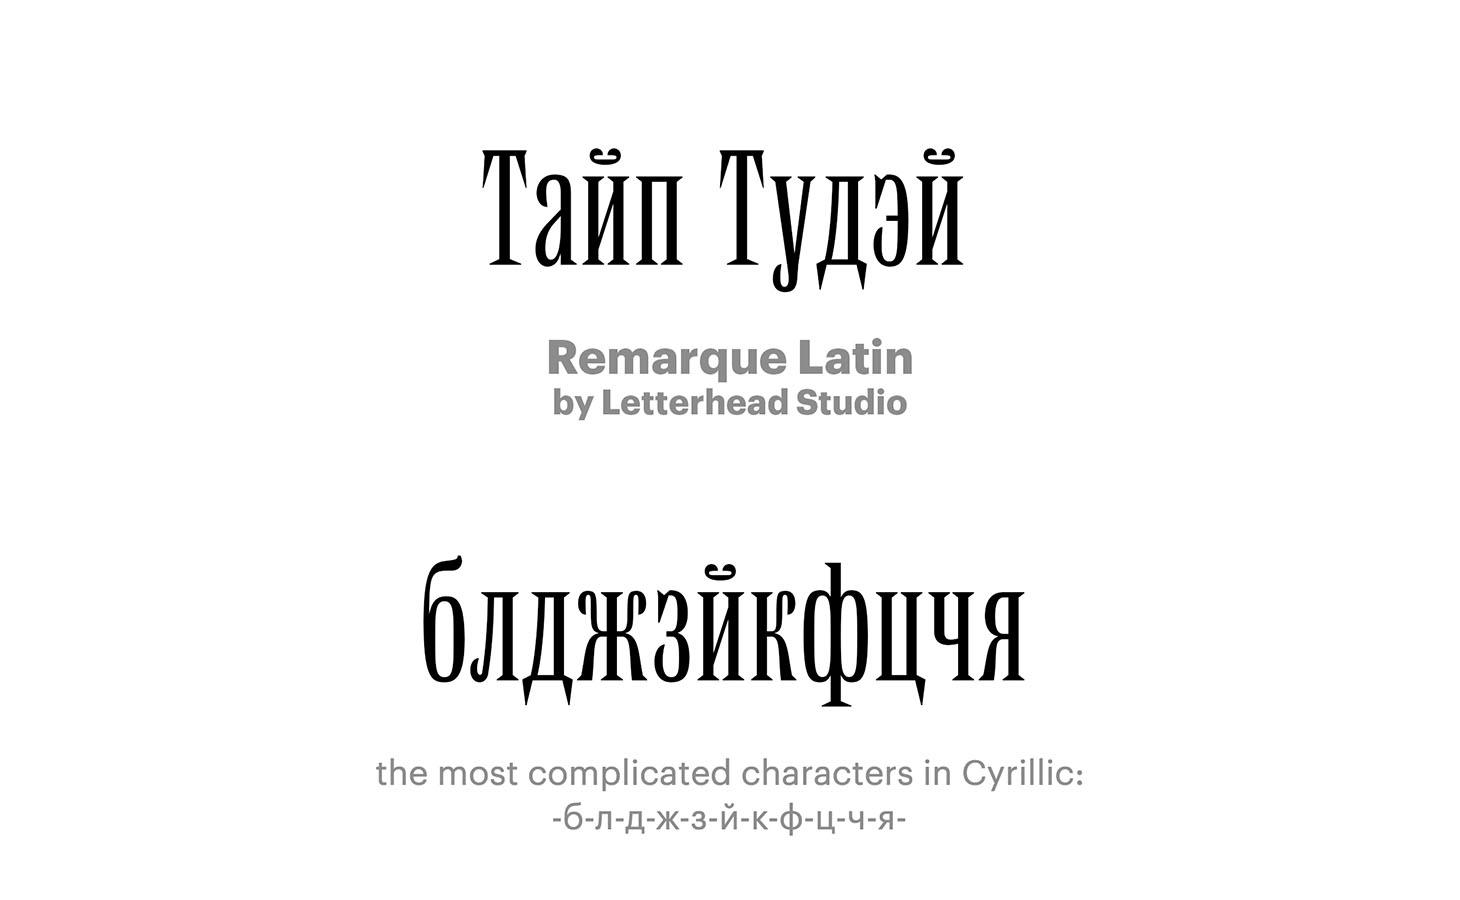 Remarque-Latin